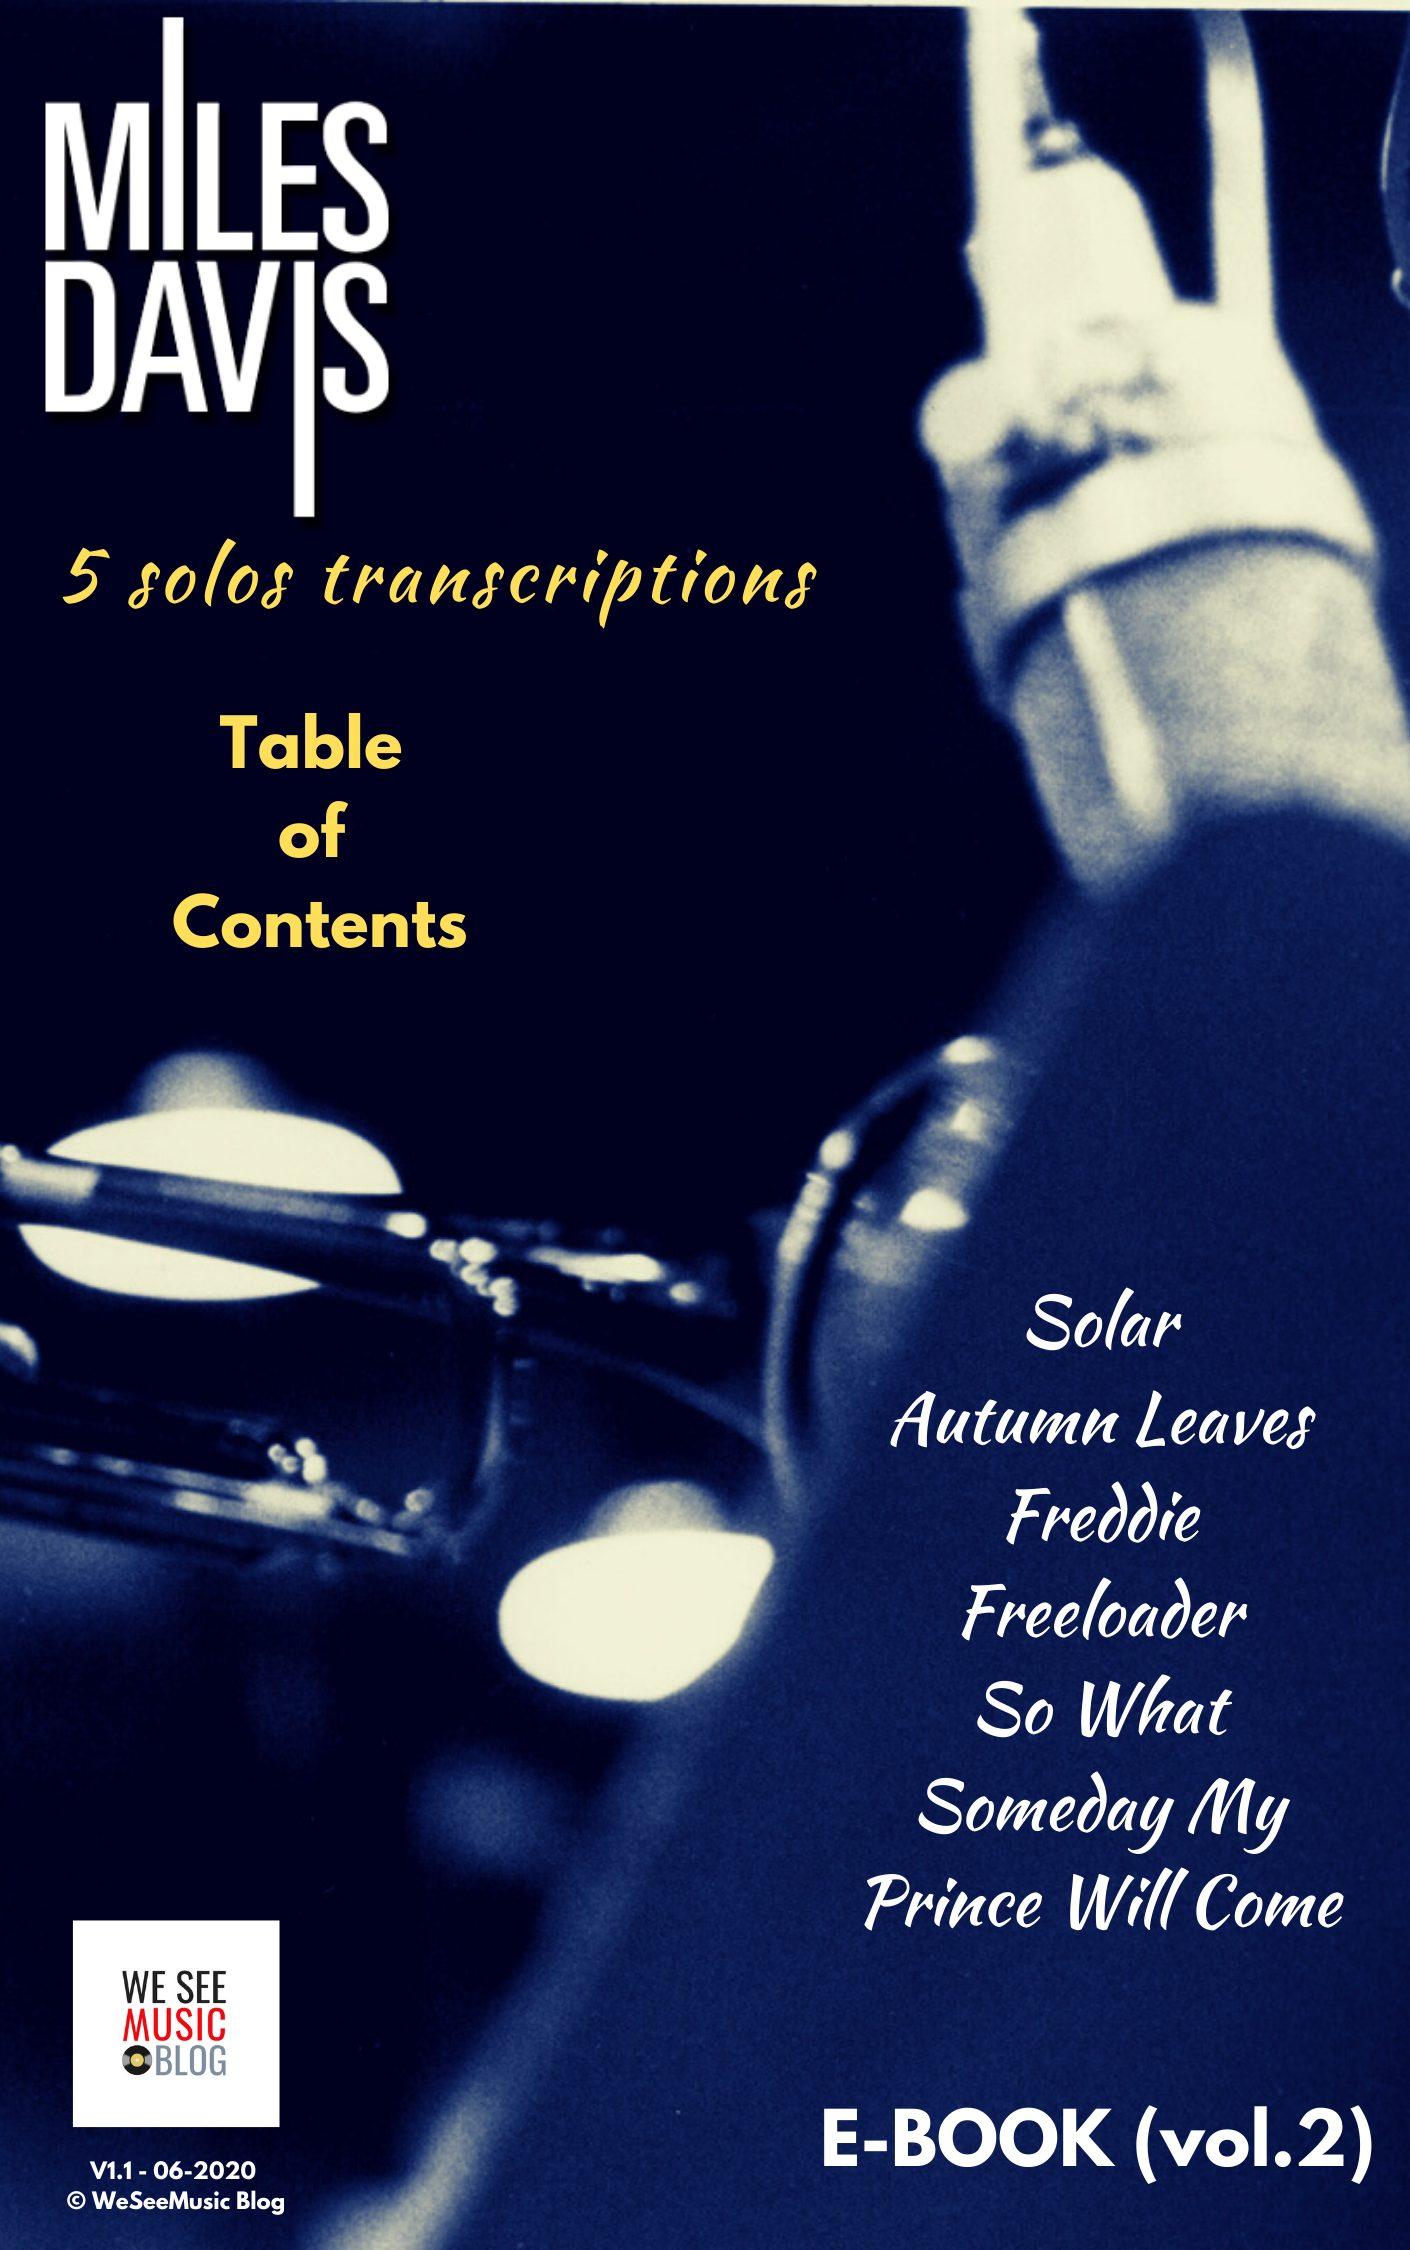 MILES-DAVIS E-book SOMMAIRE